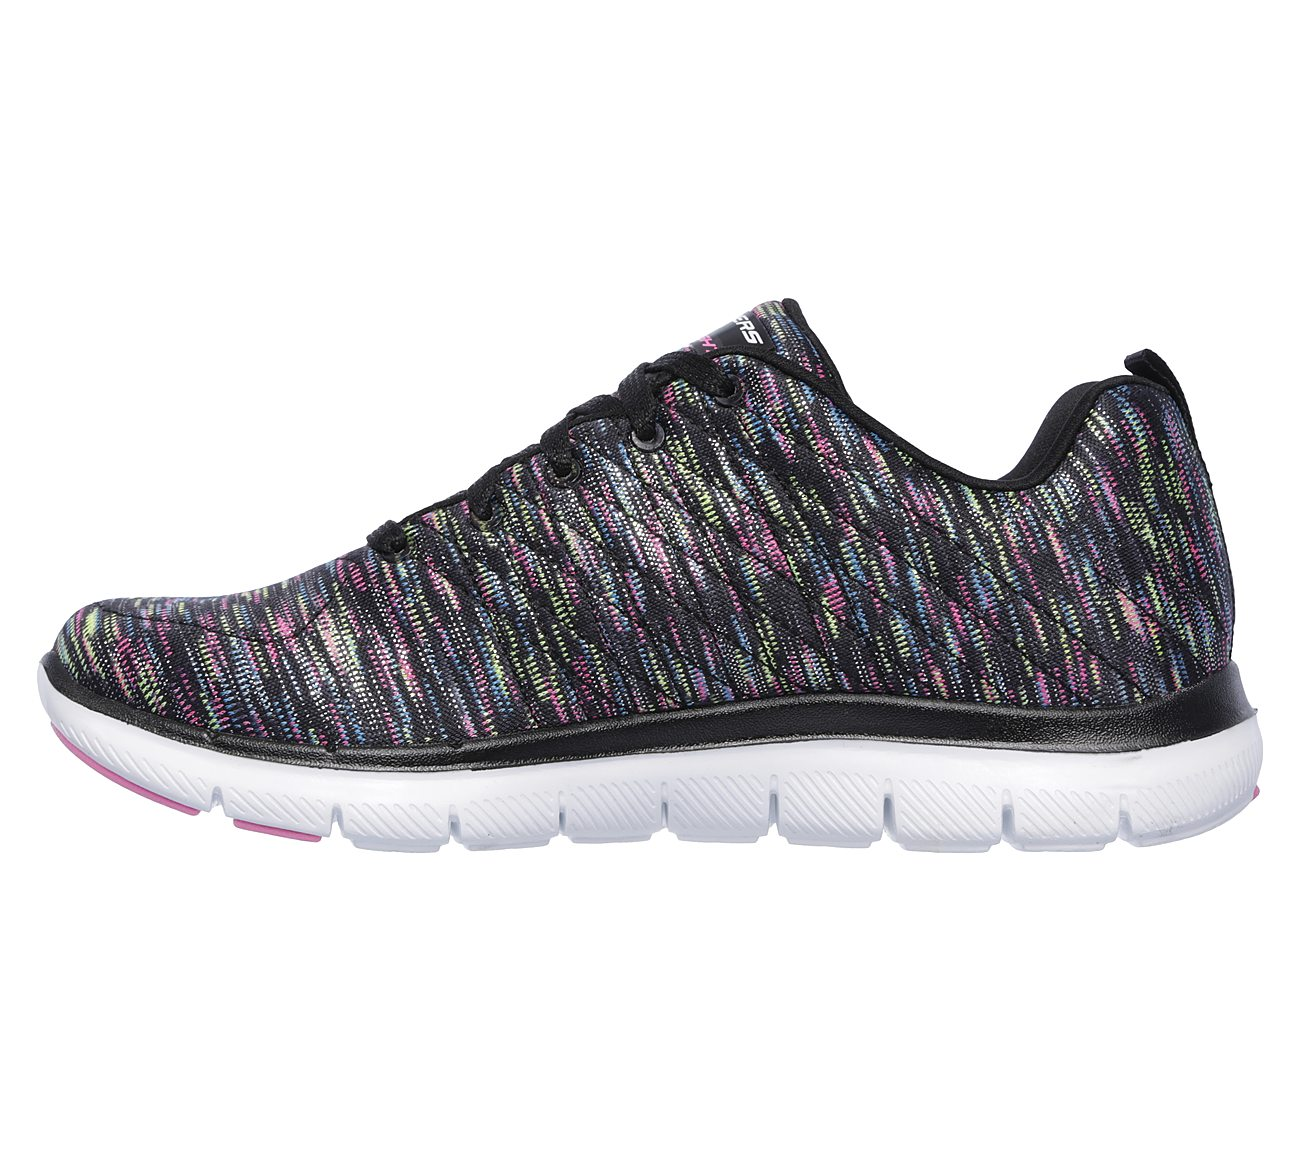 69612db9d00d Buy SKECHERS Flex Appeal 2.0 - Reflections Flex Appeal Shoes only £64.00